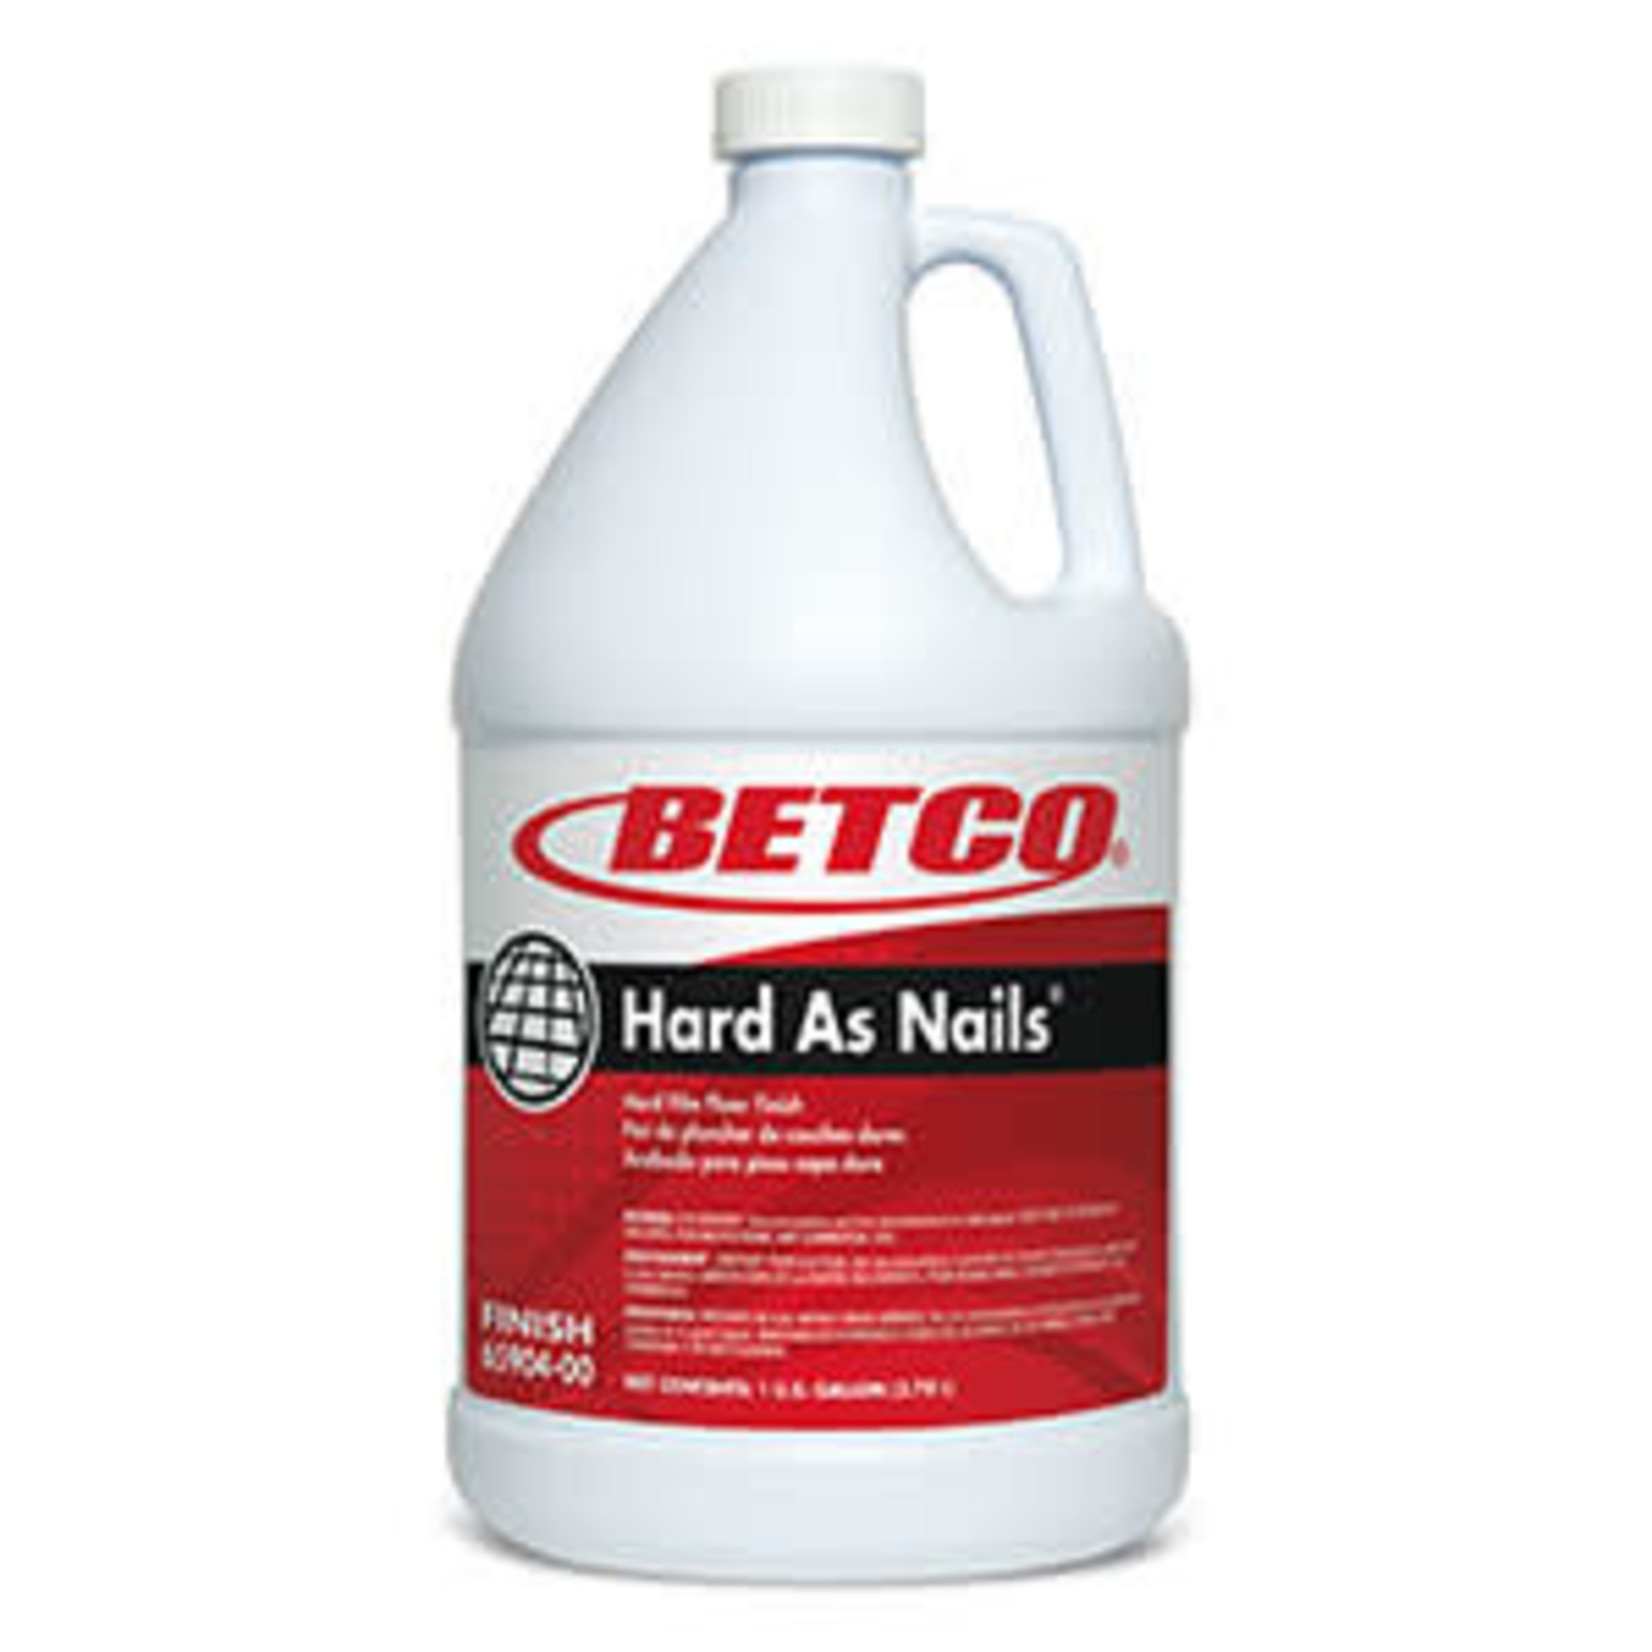 Betco Hard As Nails® Floor Finish - Gallon